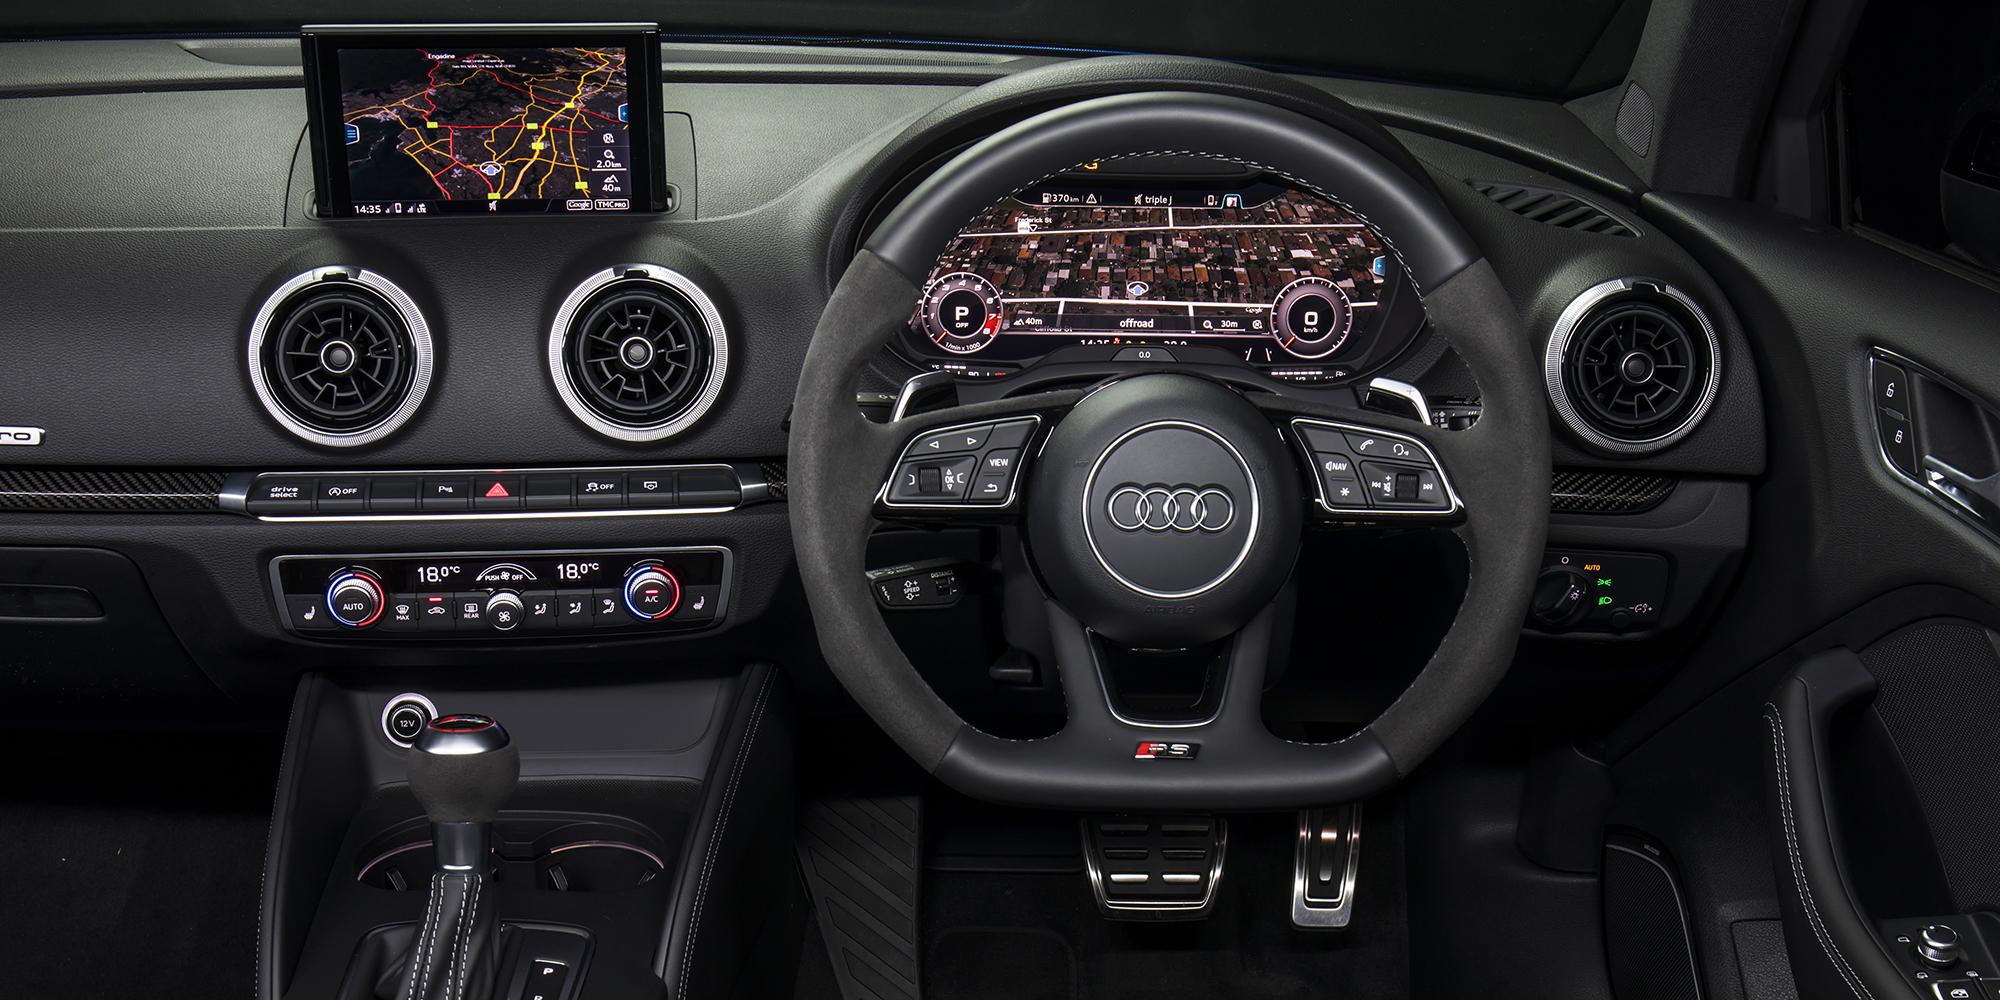 Kelebihan Kekurangan Audi Rs3 Sportback 2018 Review